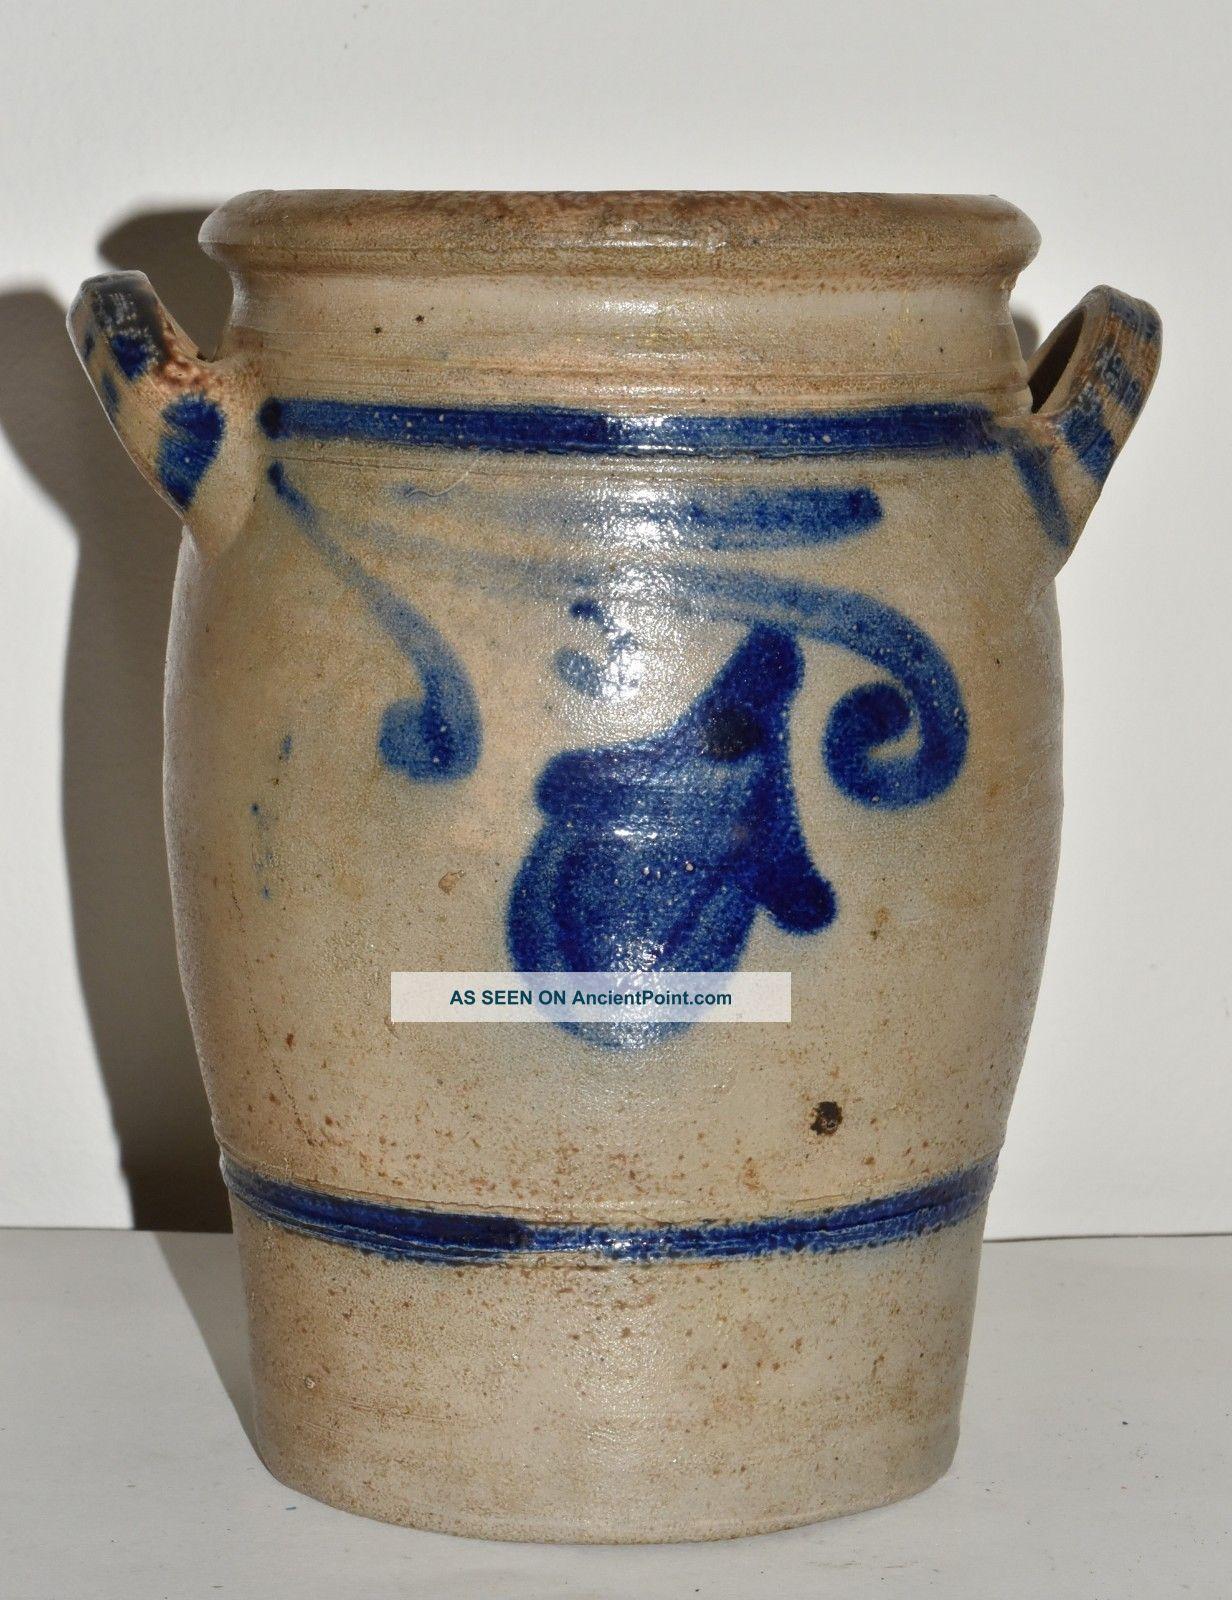 Vtg Small German 3 Pints Stoneware Crock Salt Glaze Blue Decorated 2 Crocks photo